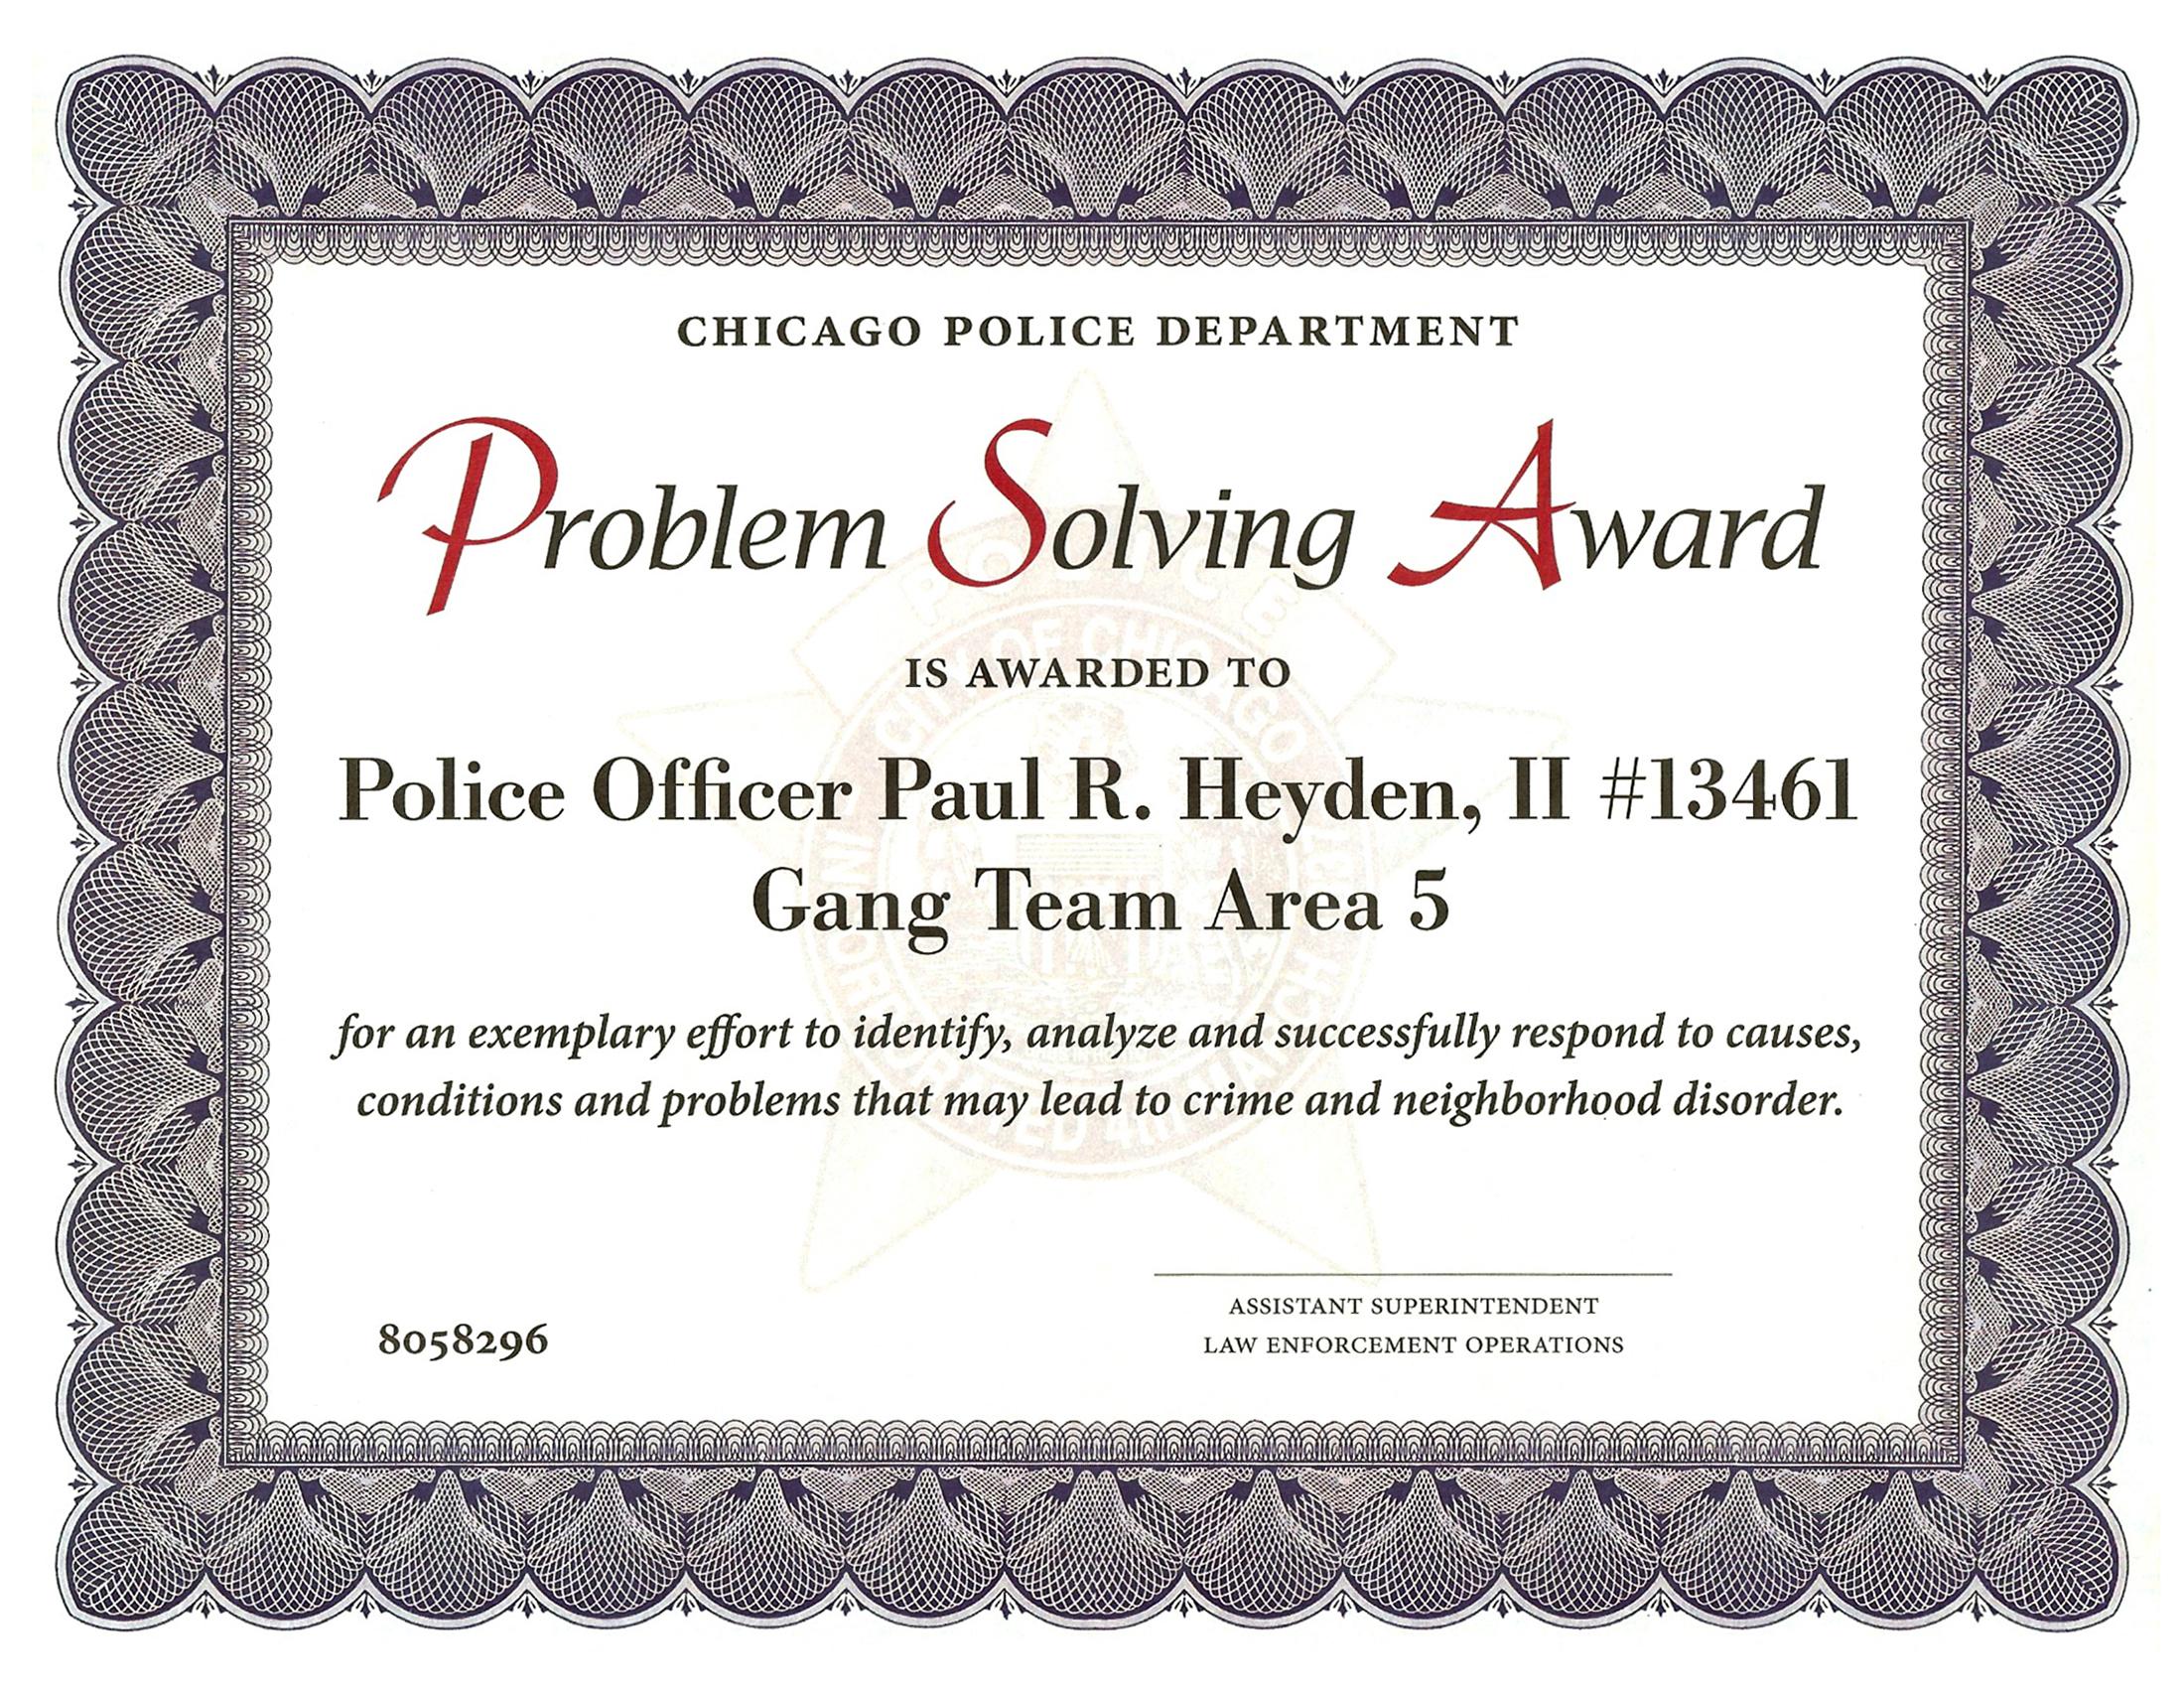 Problem Solving Award Certificate